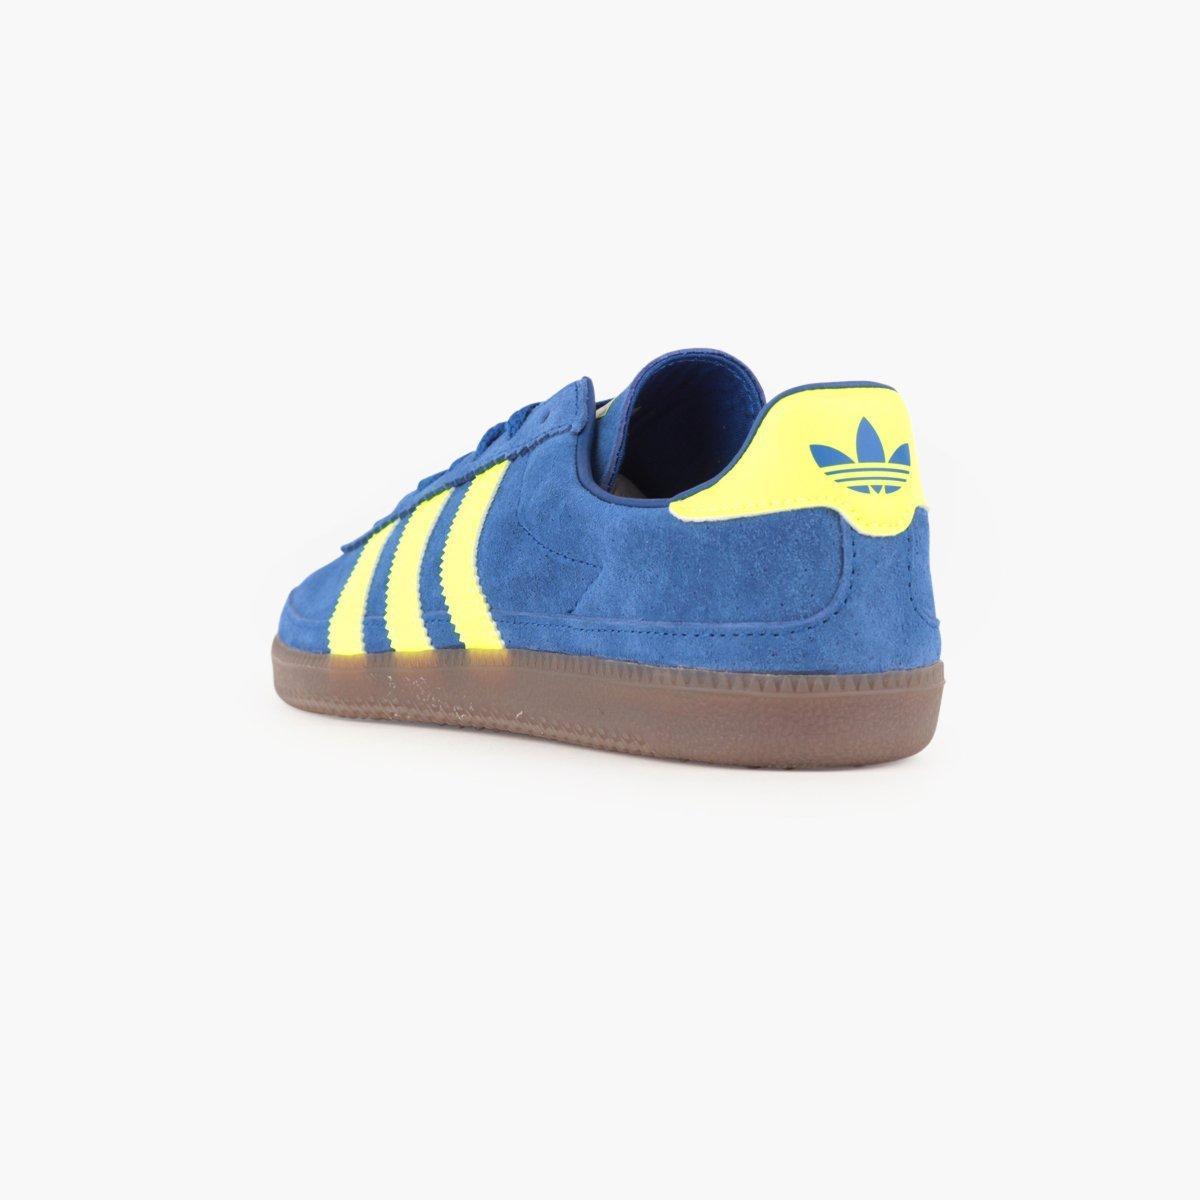 san francisco 82588 88bad Adidas Originals - Blue Adidas Whalley Spzl for Men - Lyst. View fullscreen